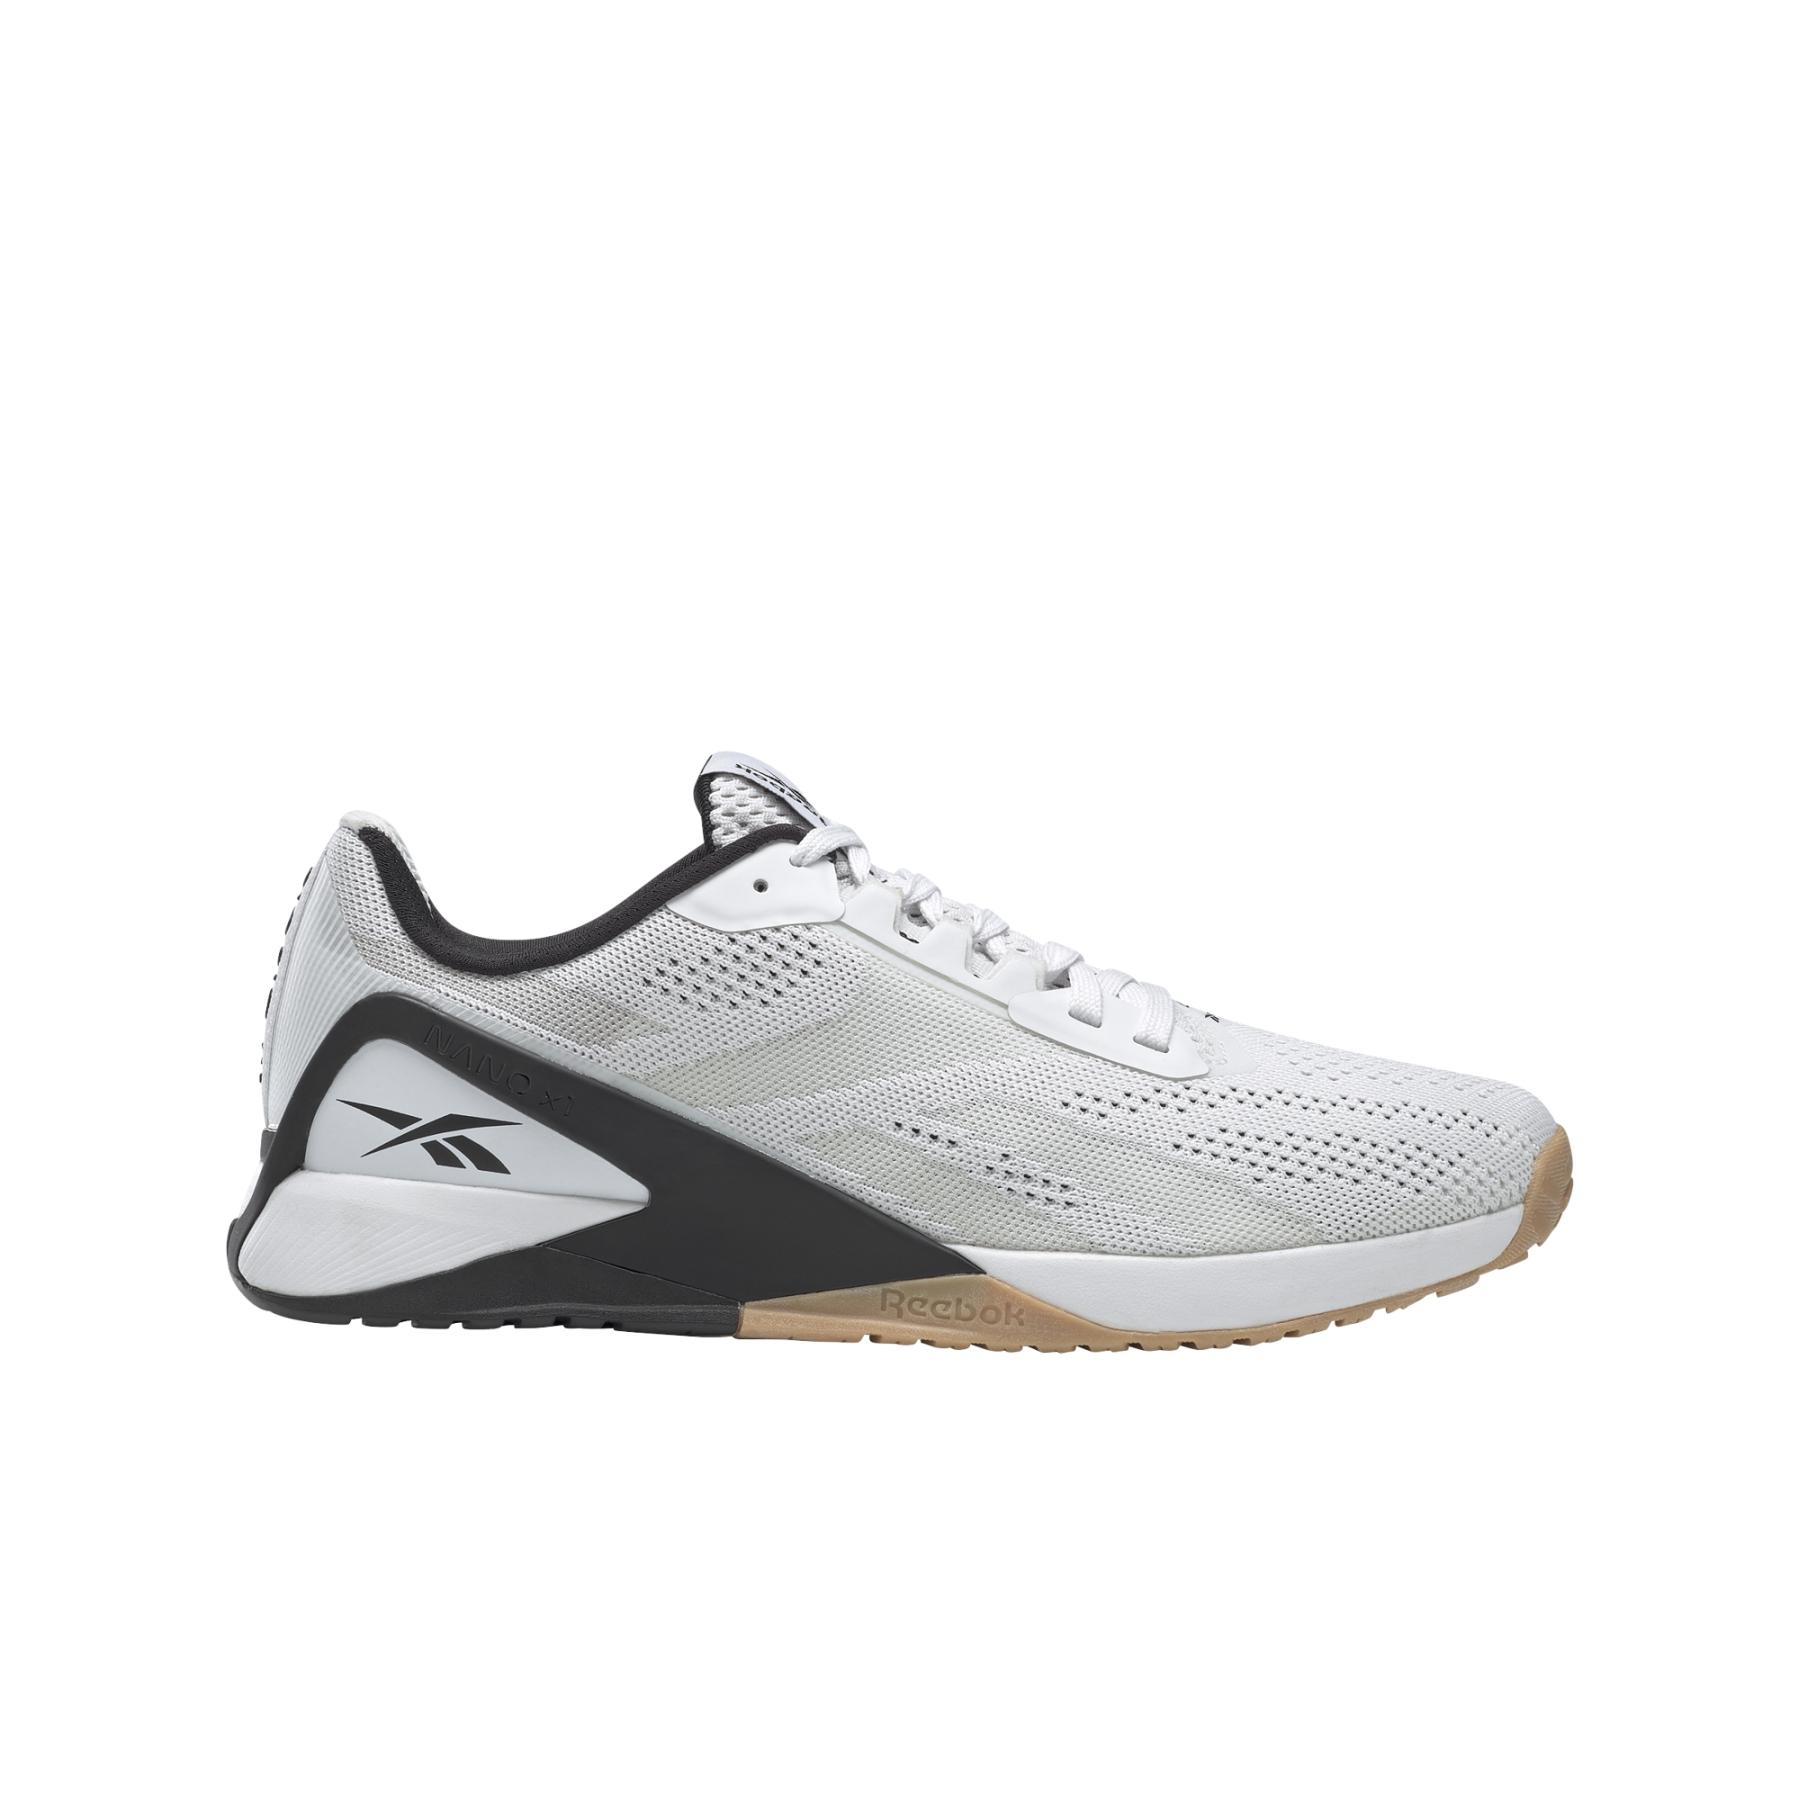 Reebok Nano X1 Herren-Fitnessschuh - white/black/reebok rubber gum-01 FZ0634